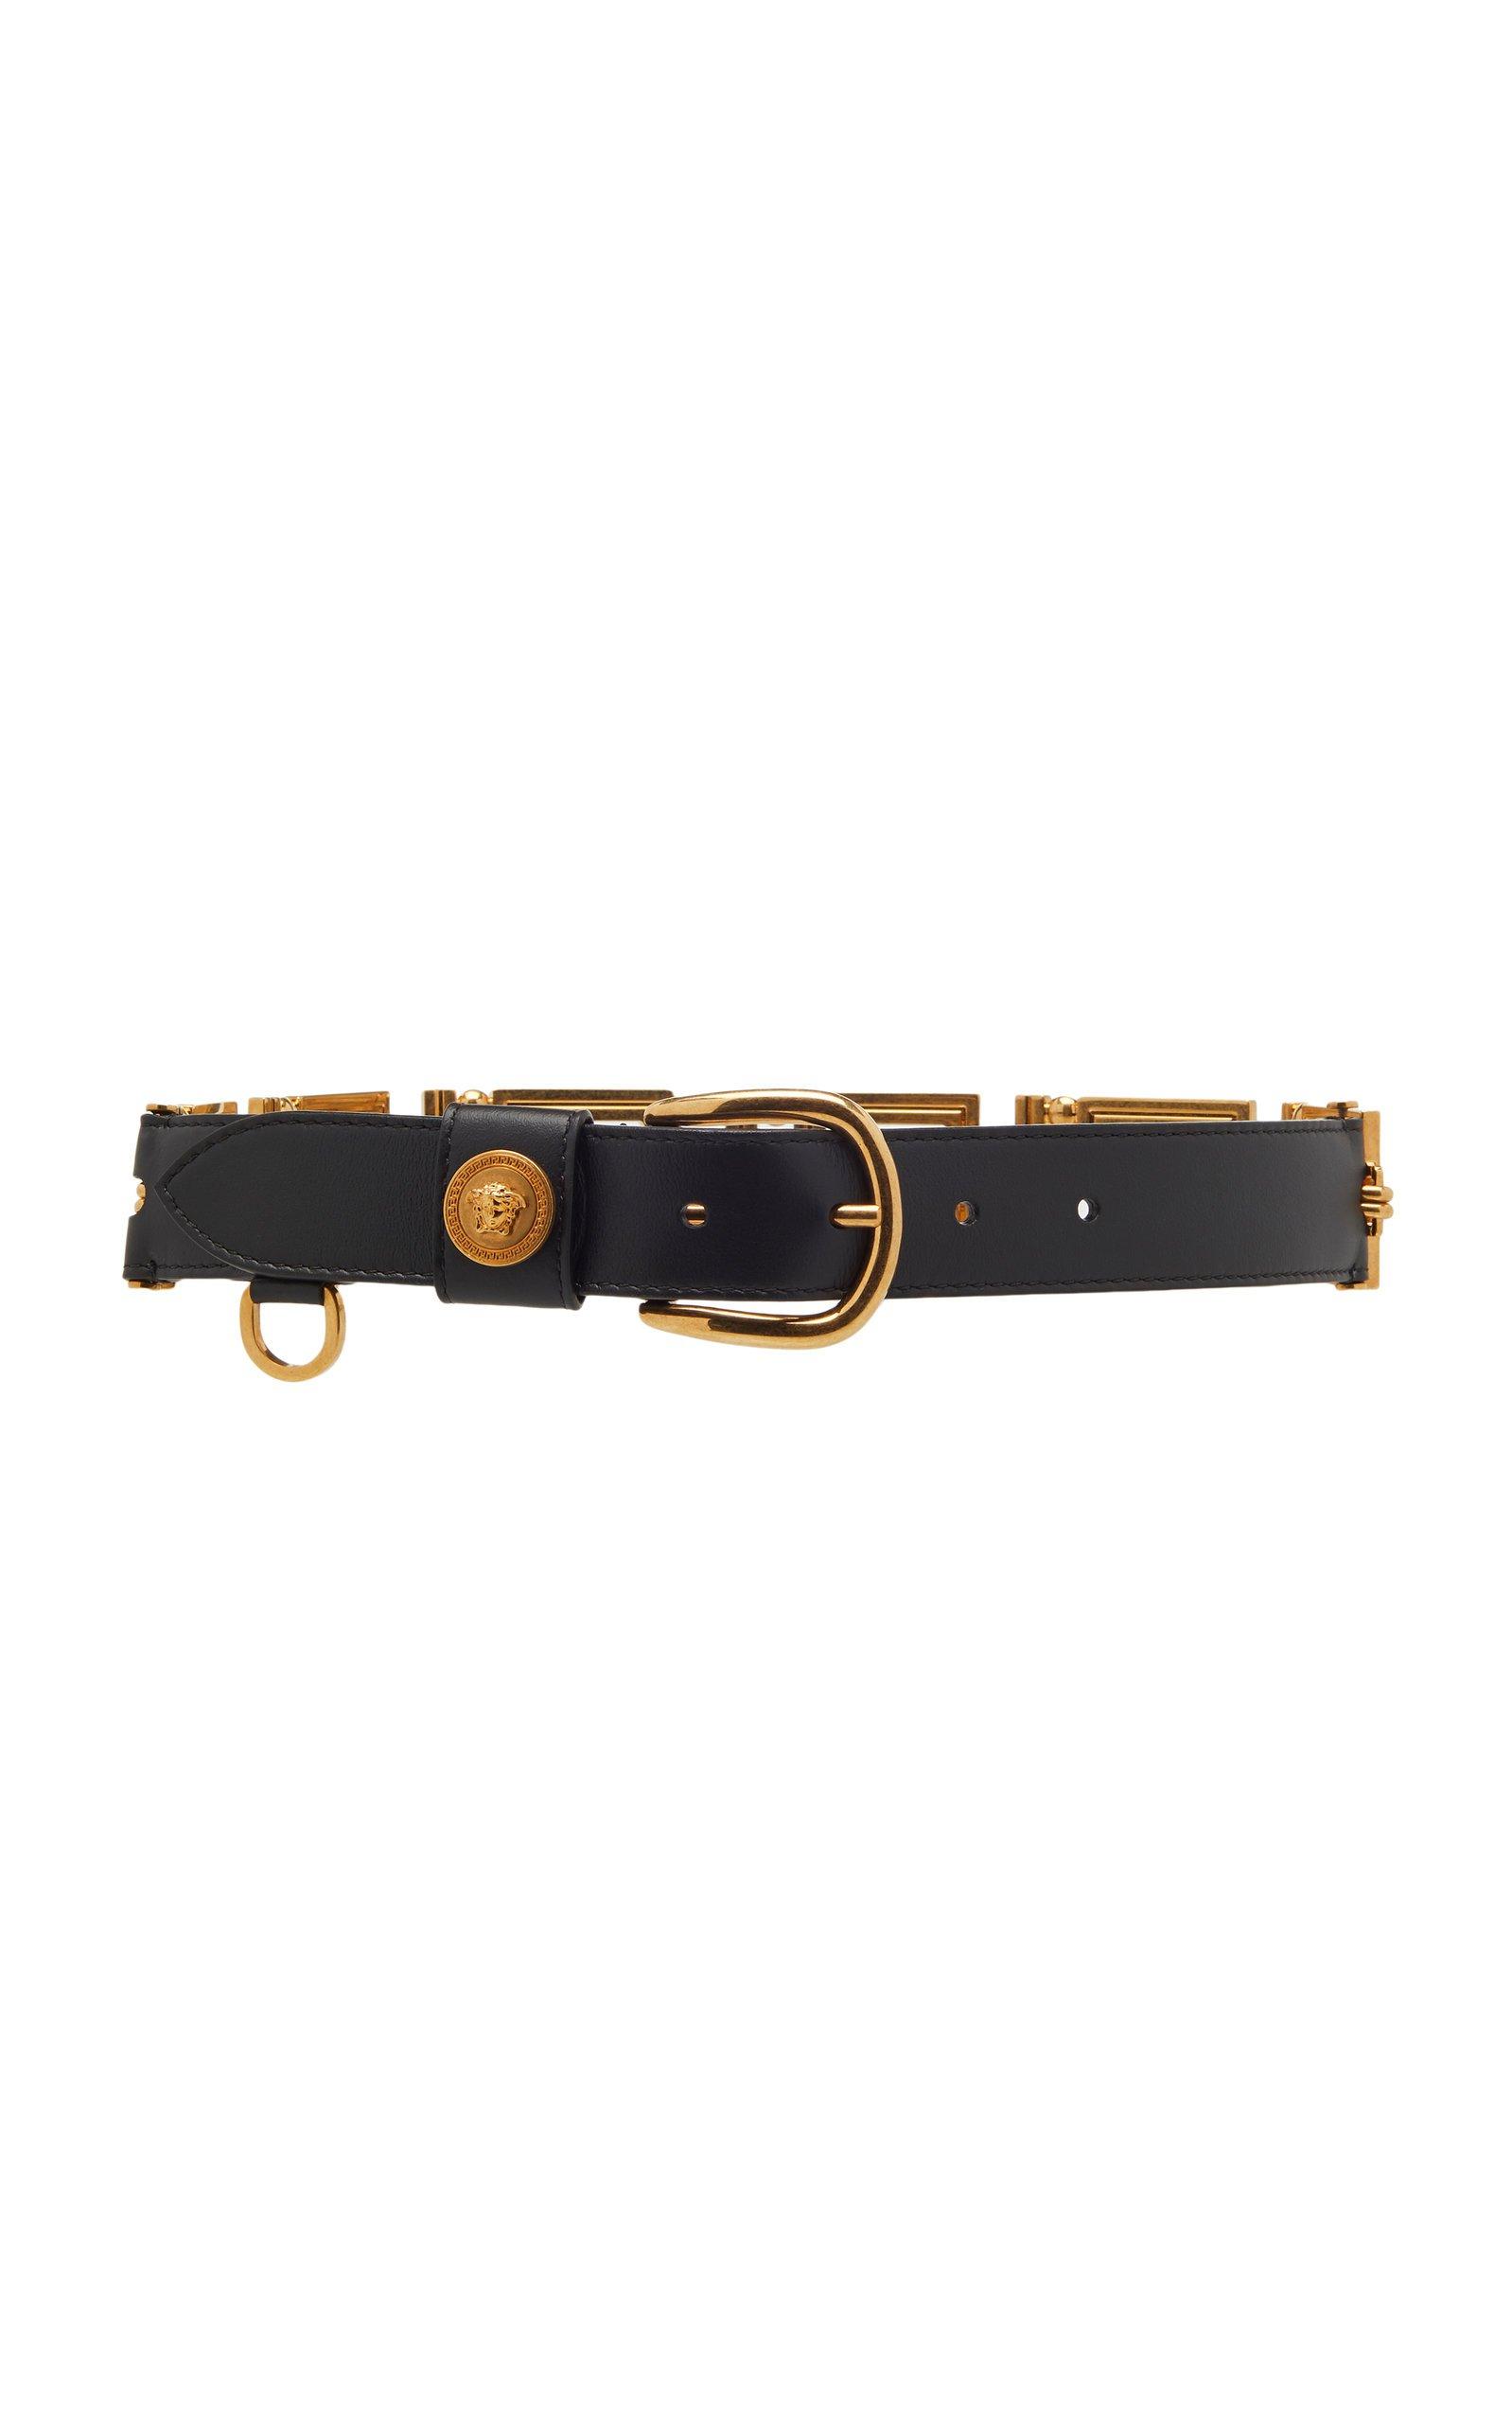 Versace Leather Belt Size: 80 cm